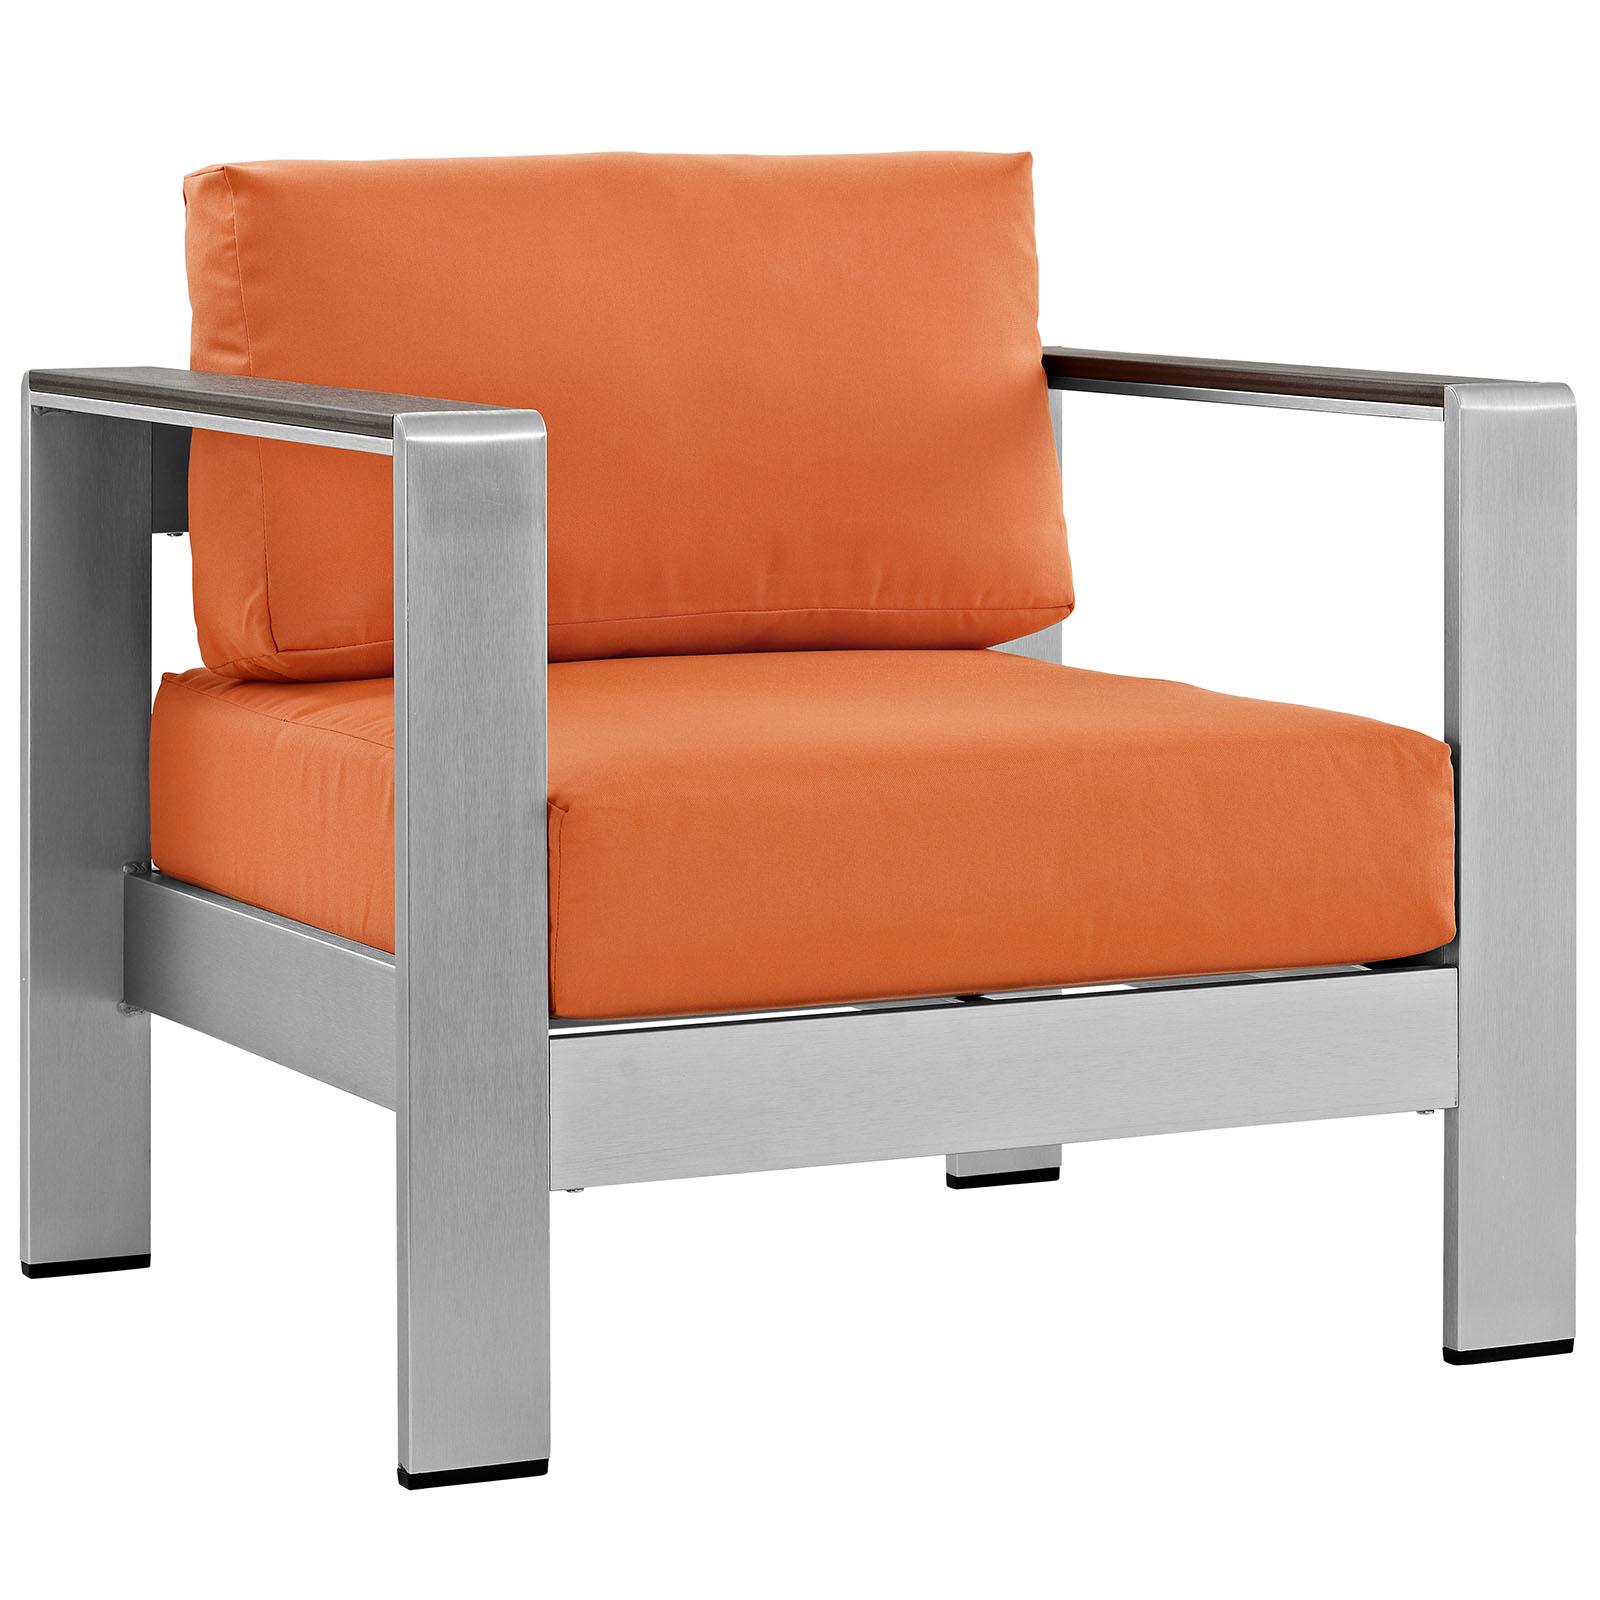 Modern Contemporary Urban Design Outdoor Patio Balcony Lounge Chair, Orange, Metal Aluminum